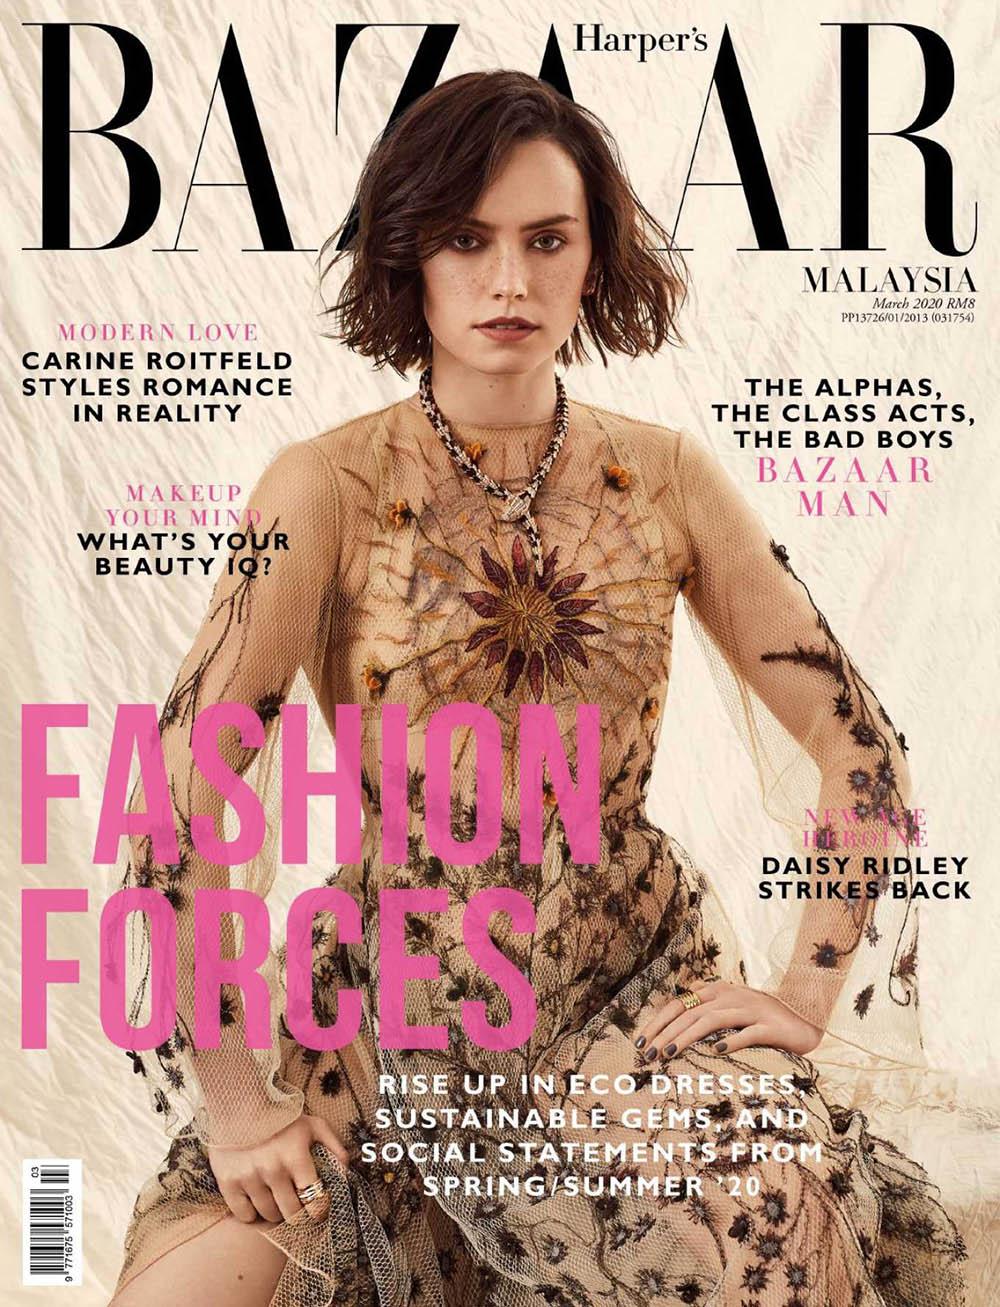 Daisy Ridley covers Harper's Bazaar Malaysia March 2020 by Lara Jade